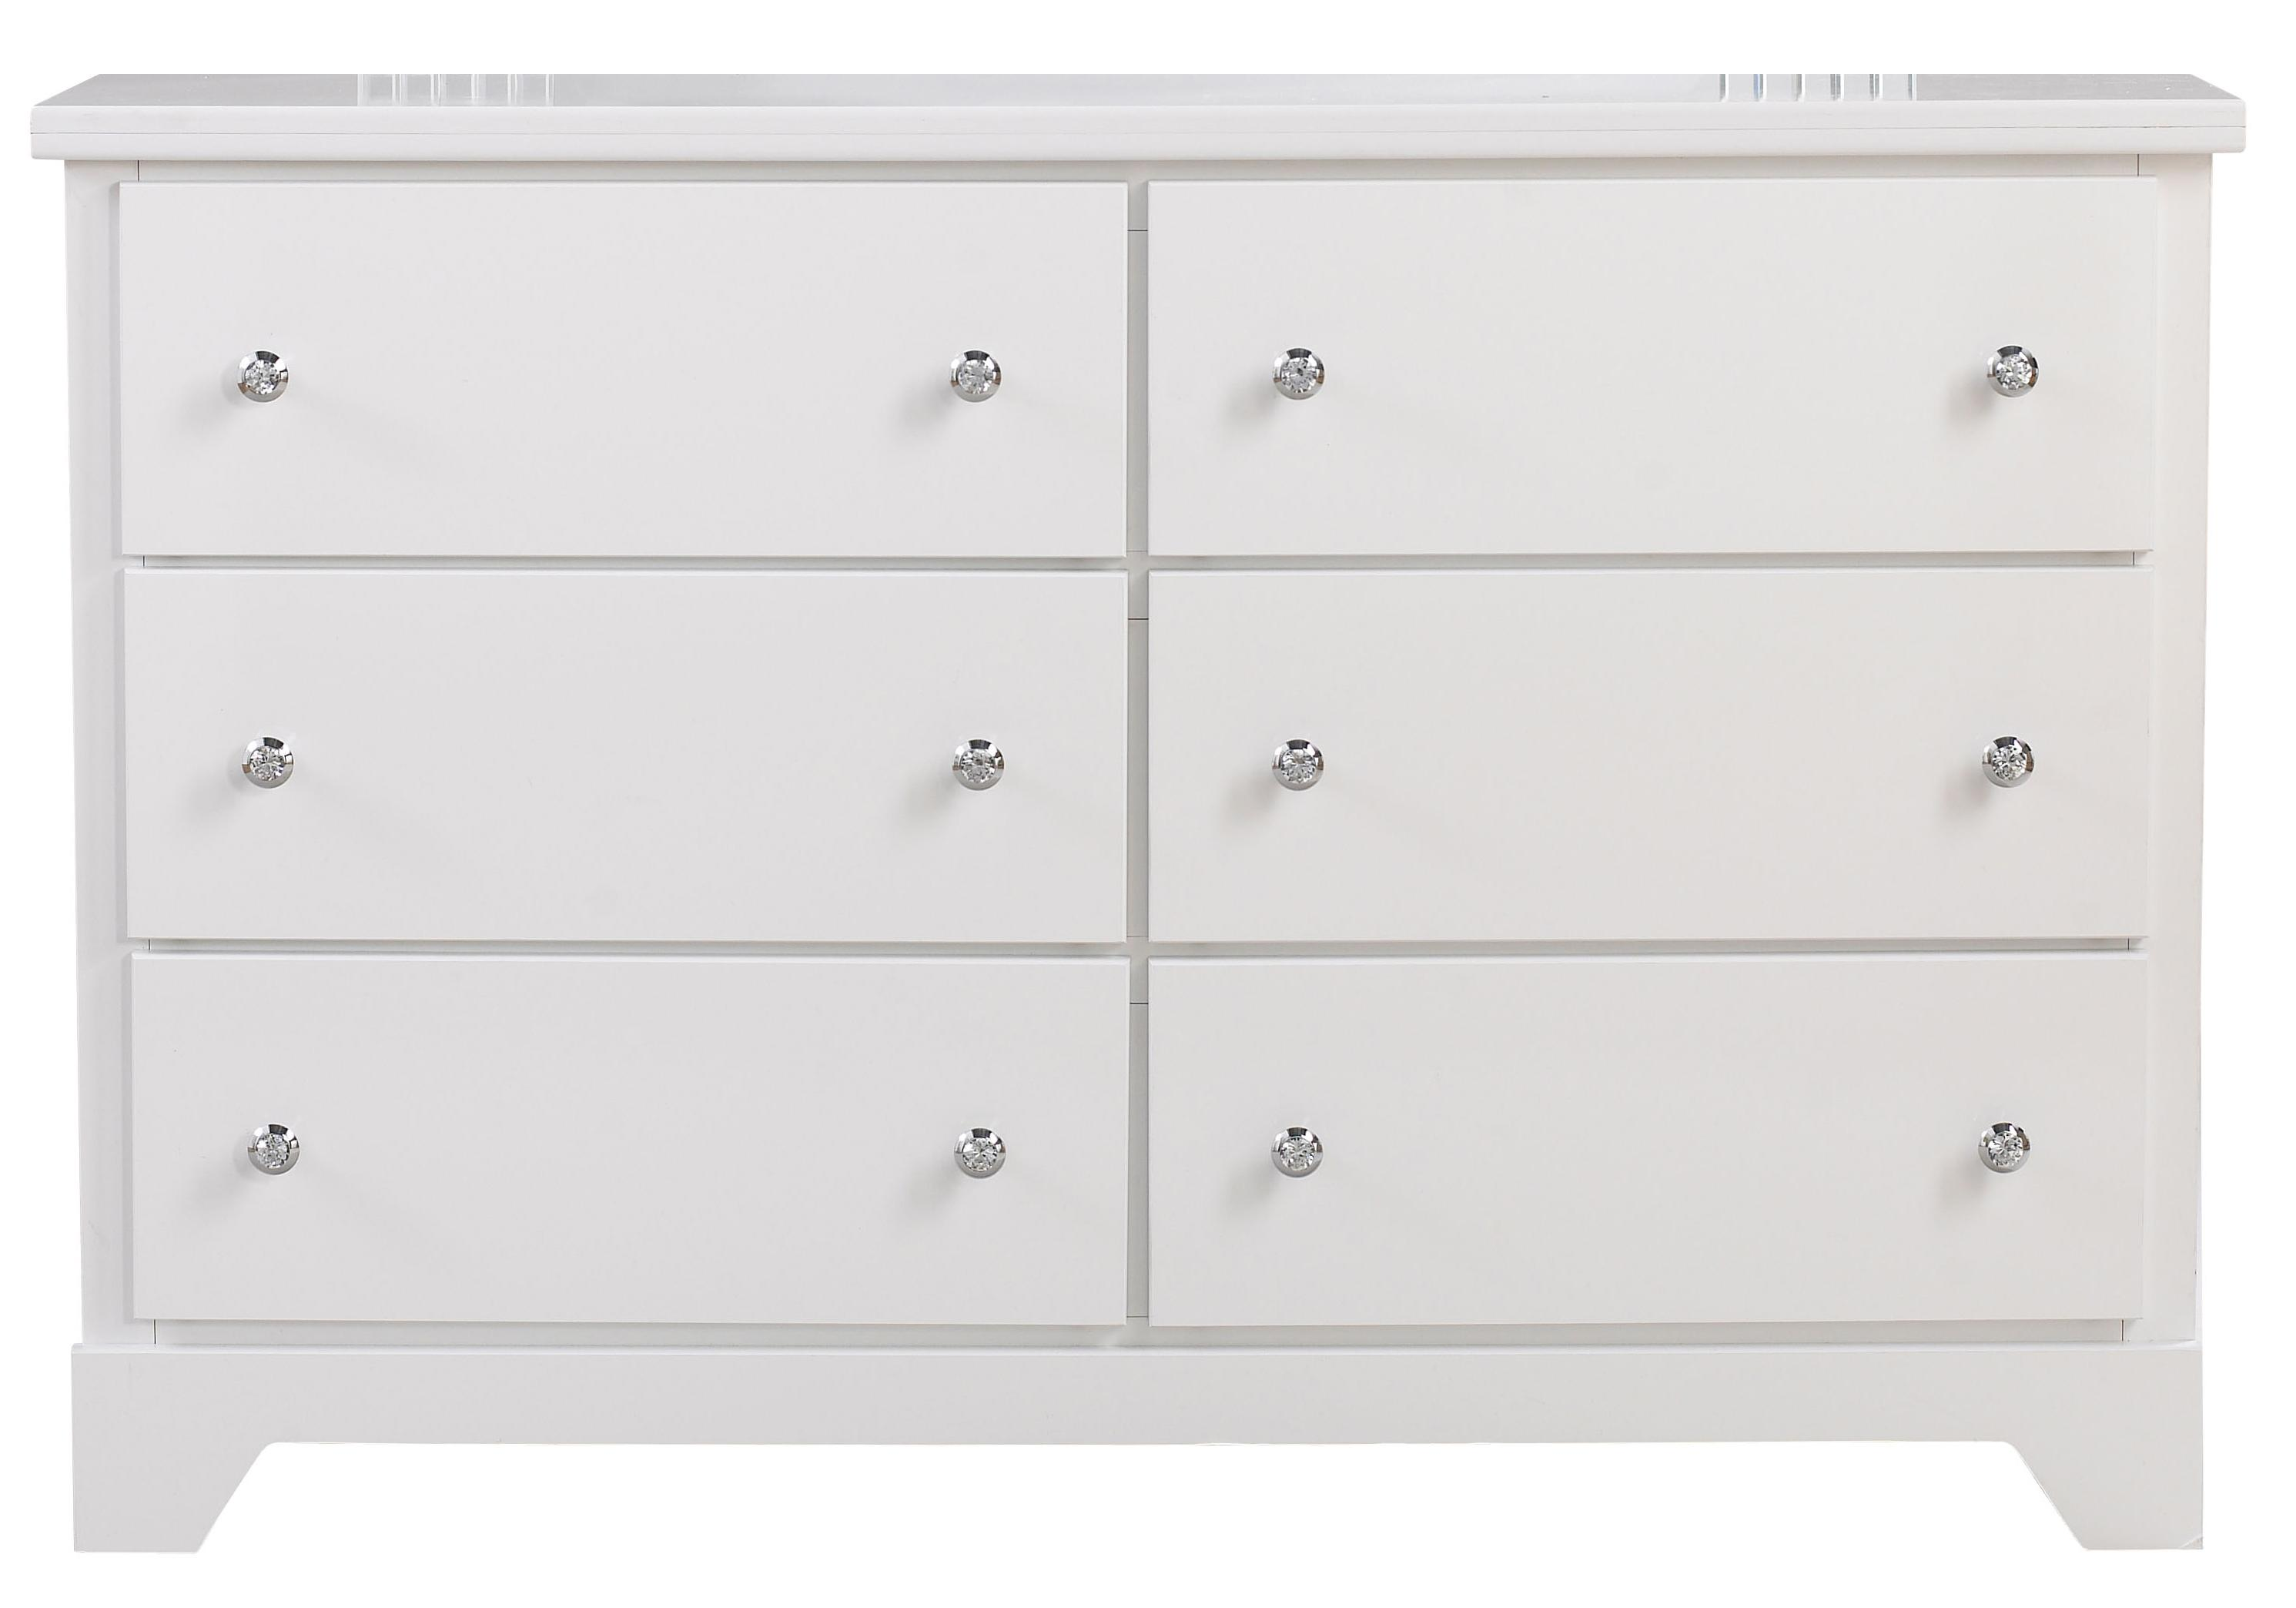 Standard Furniture Marilyn Youth White 6 Drawer Dresser - Item Number: 66309